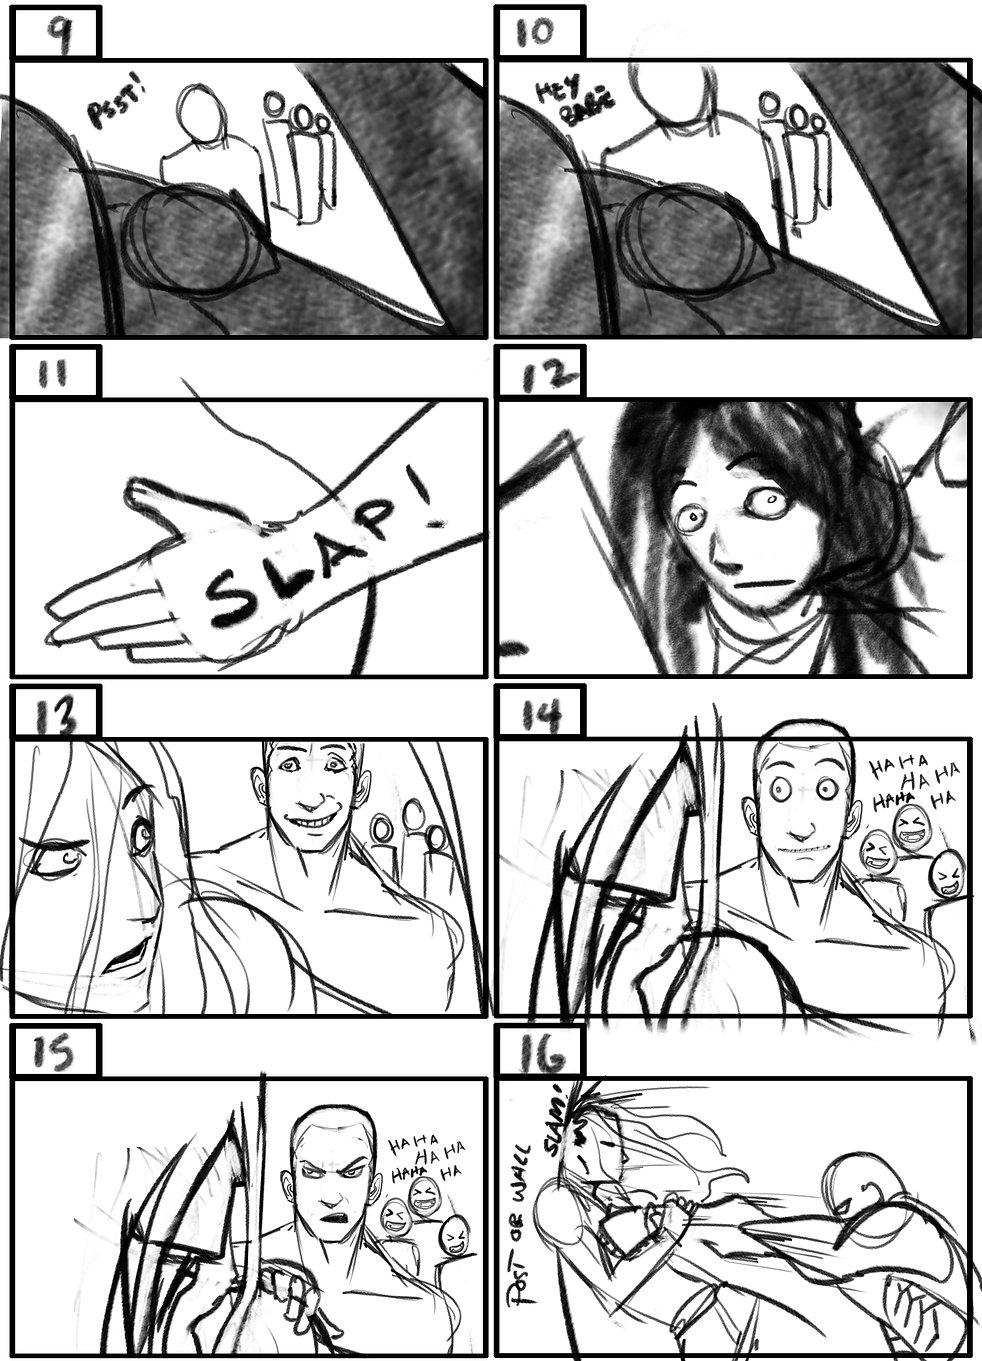 Vantaraelle Storyboard_002.jpg